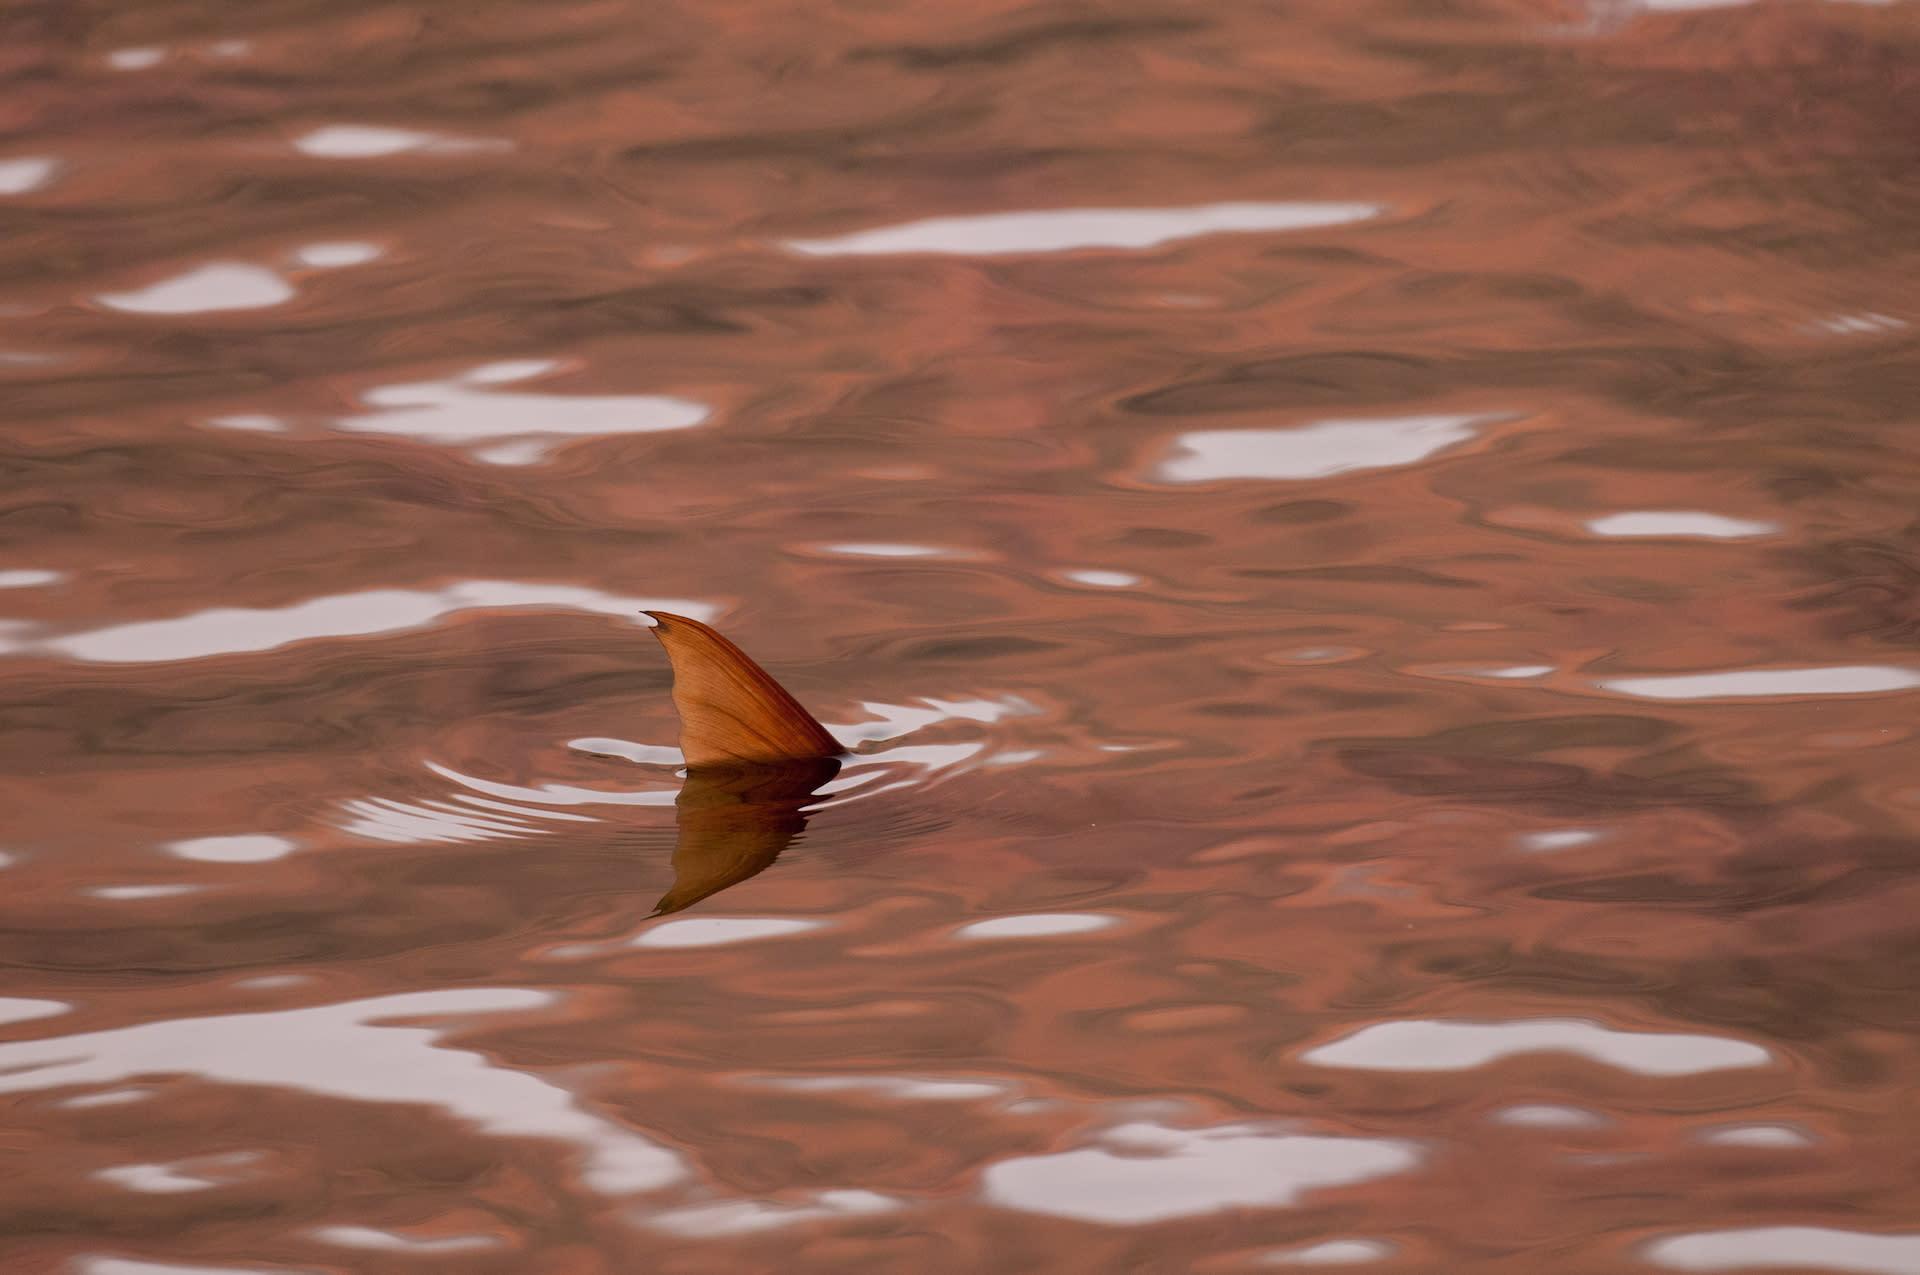 Humpback Mahseer: Big Fish in a Small World